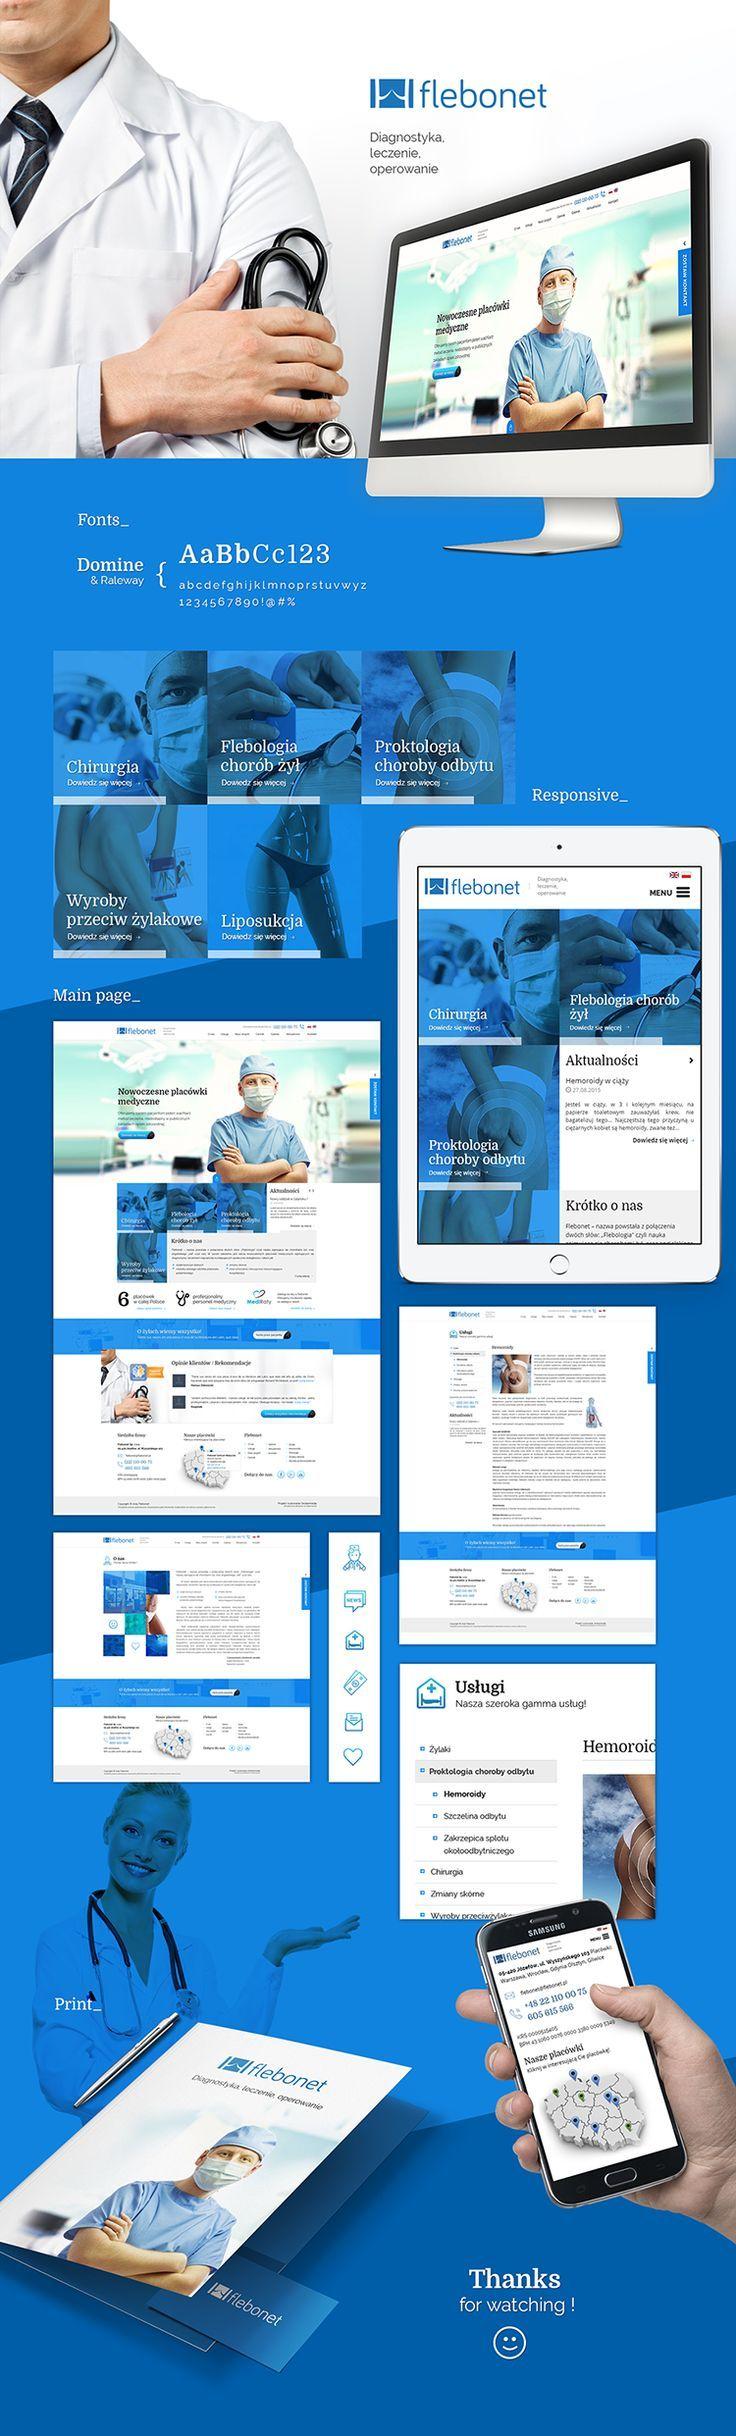 Flebonet – Medic centrum